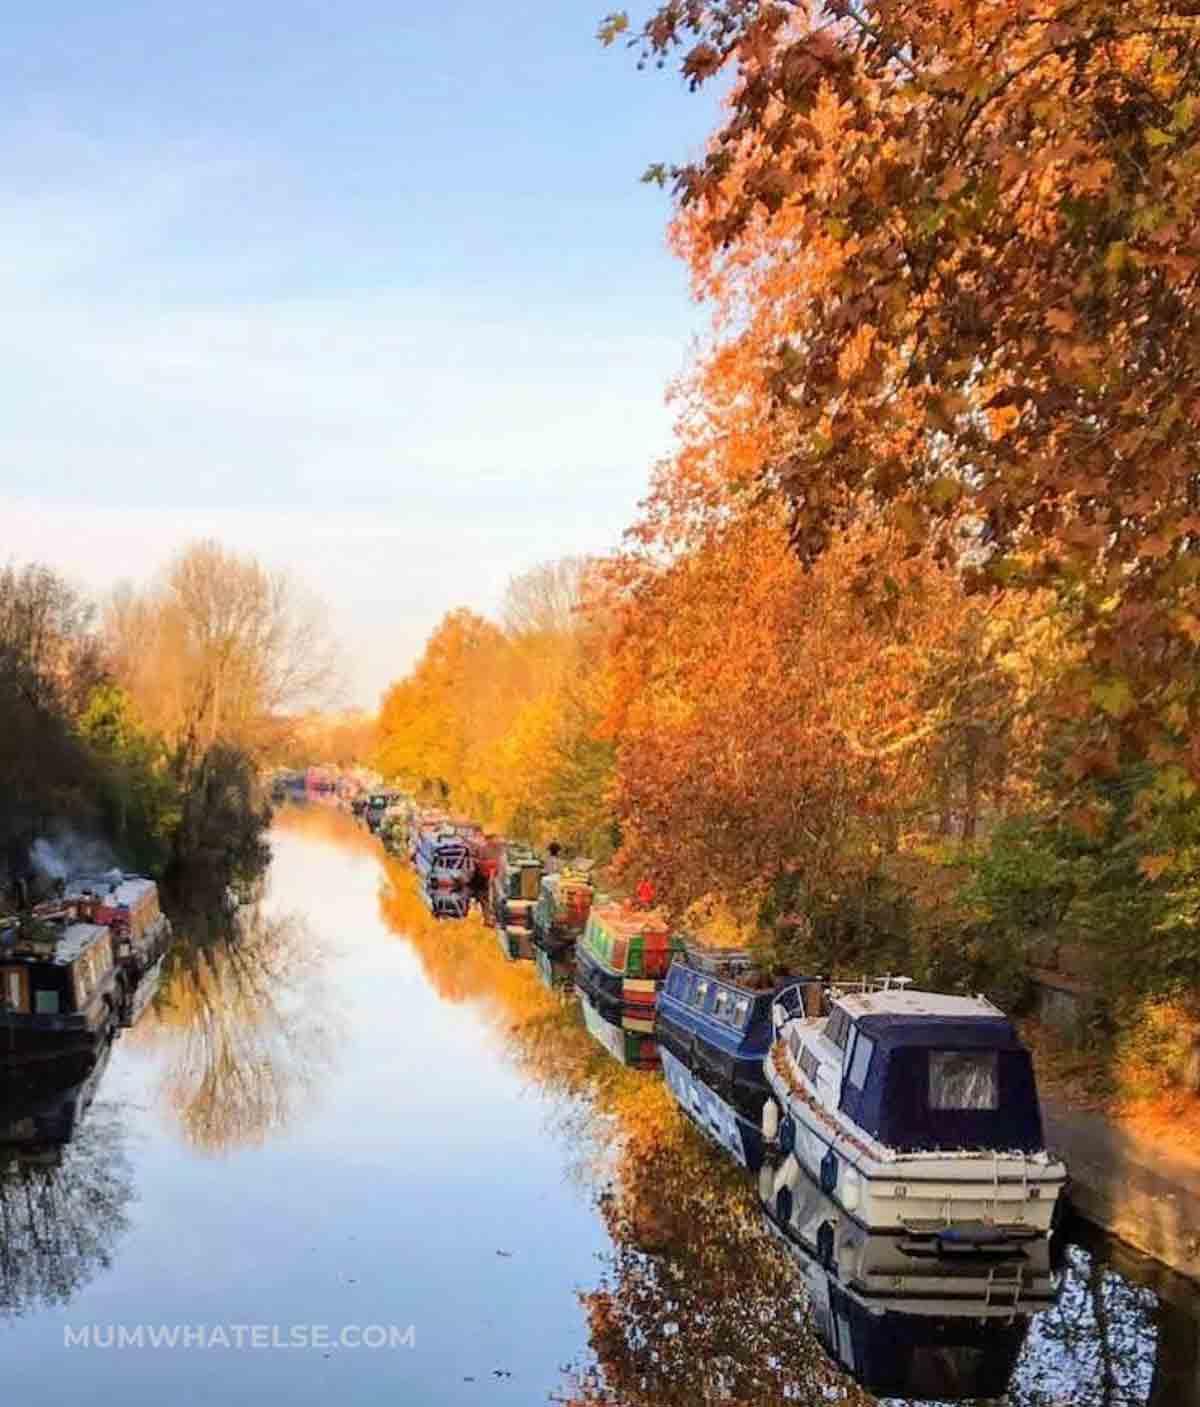 il regent's Canal a Little Venice con le barche parcheggiate lungo il canale